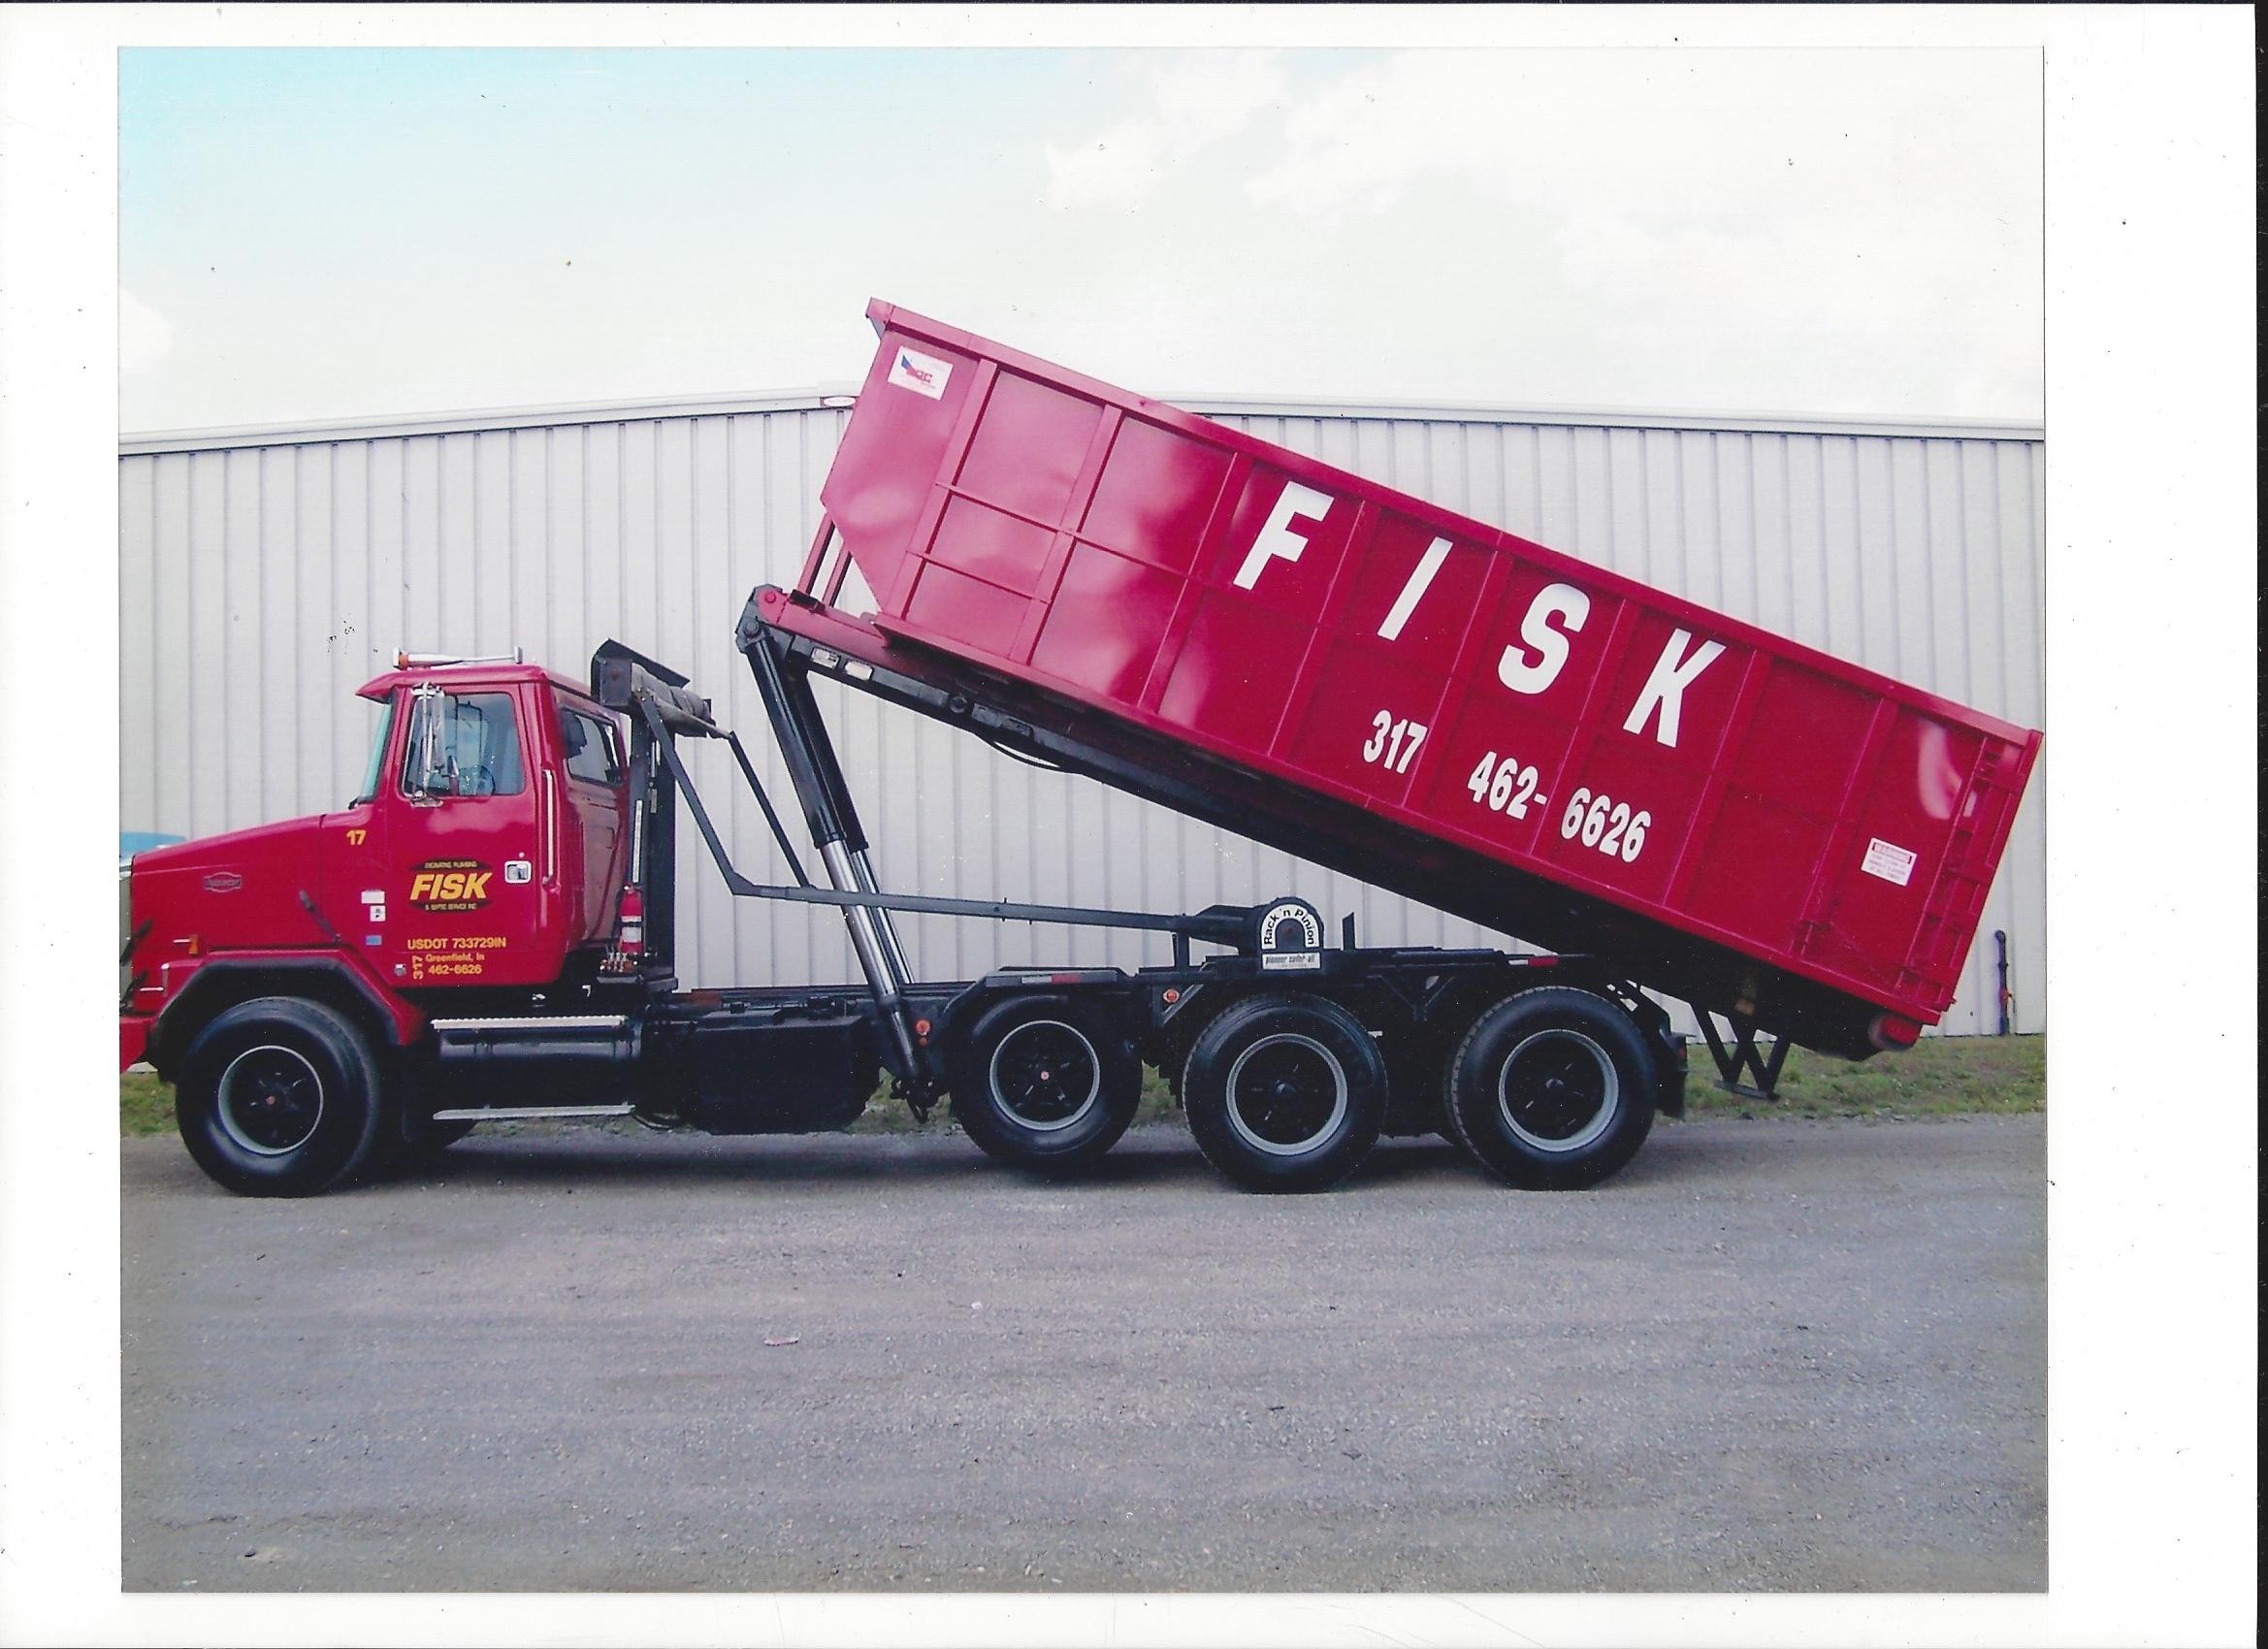 trash truck 7 1-21-18.jpg